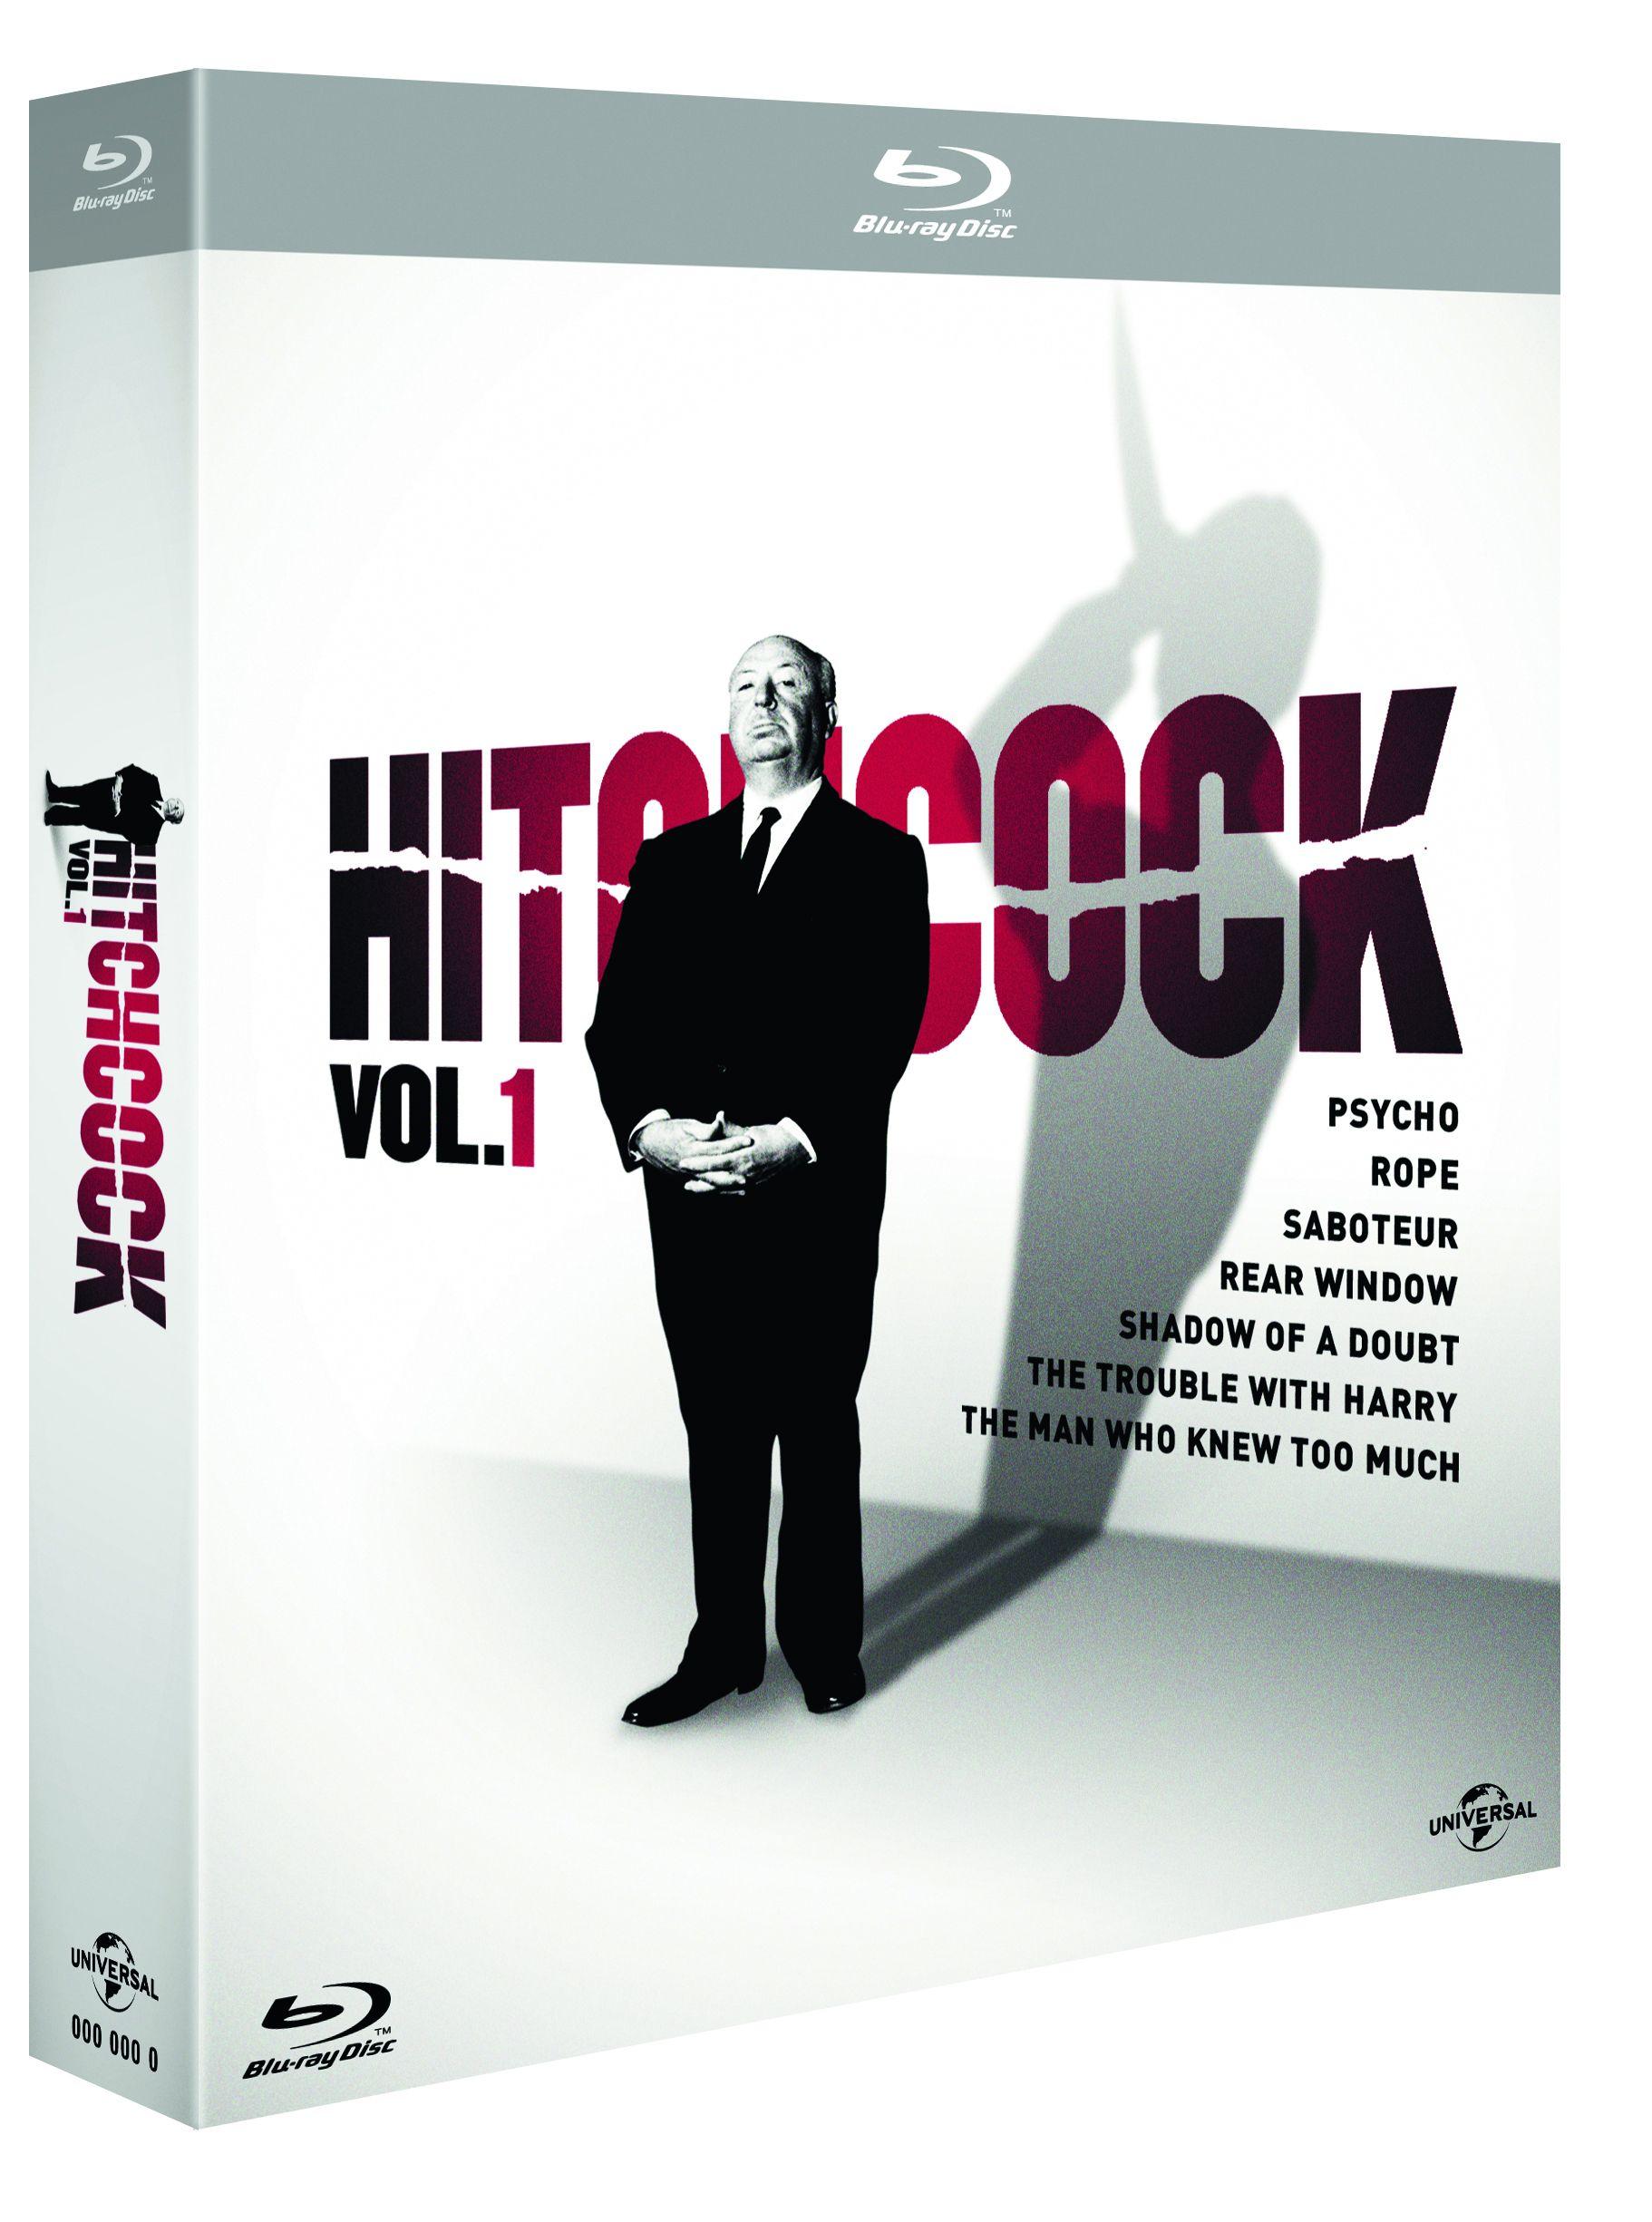 hitchcock boxset 1 blu-ray